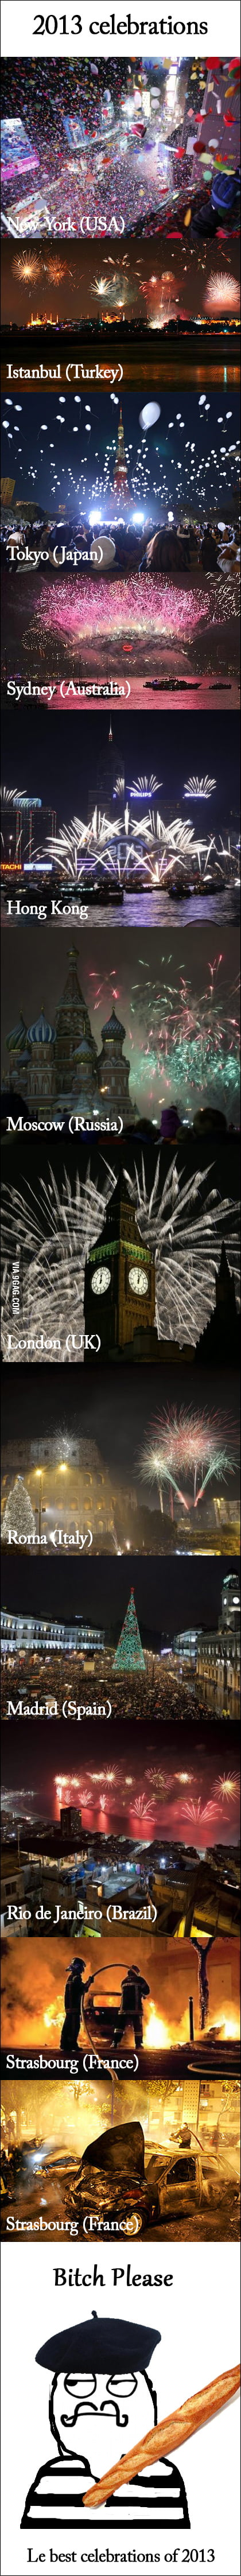 Celebrations of 2013